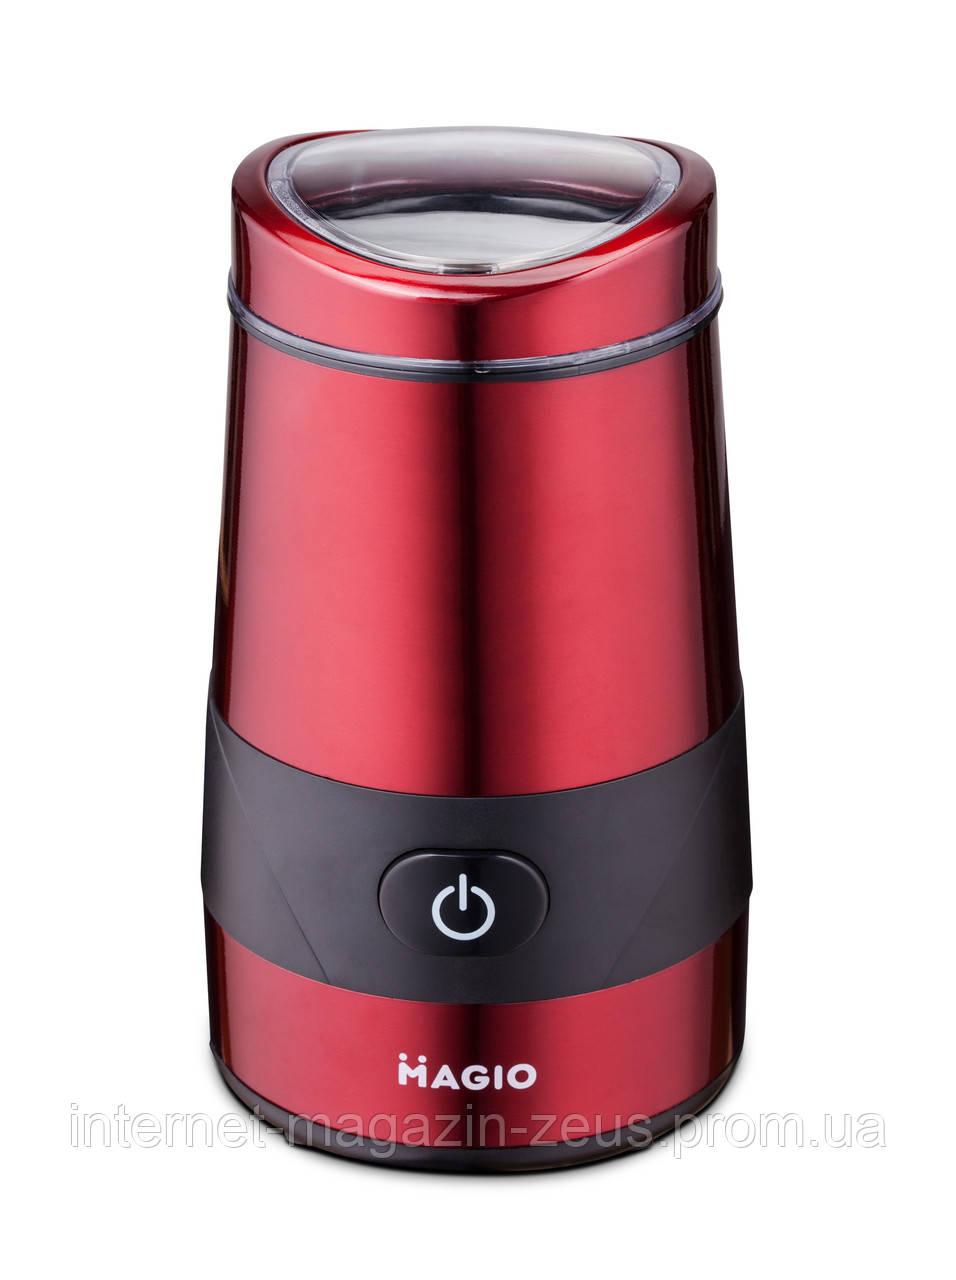 Кофемолка Magio MG 204